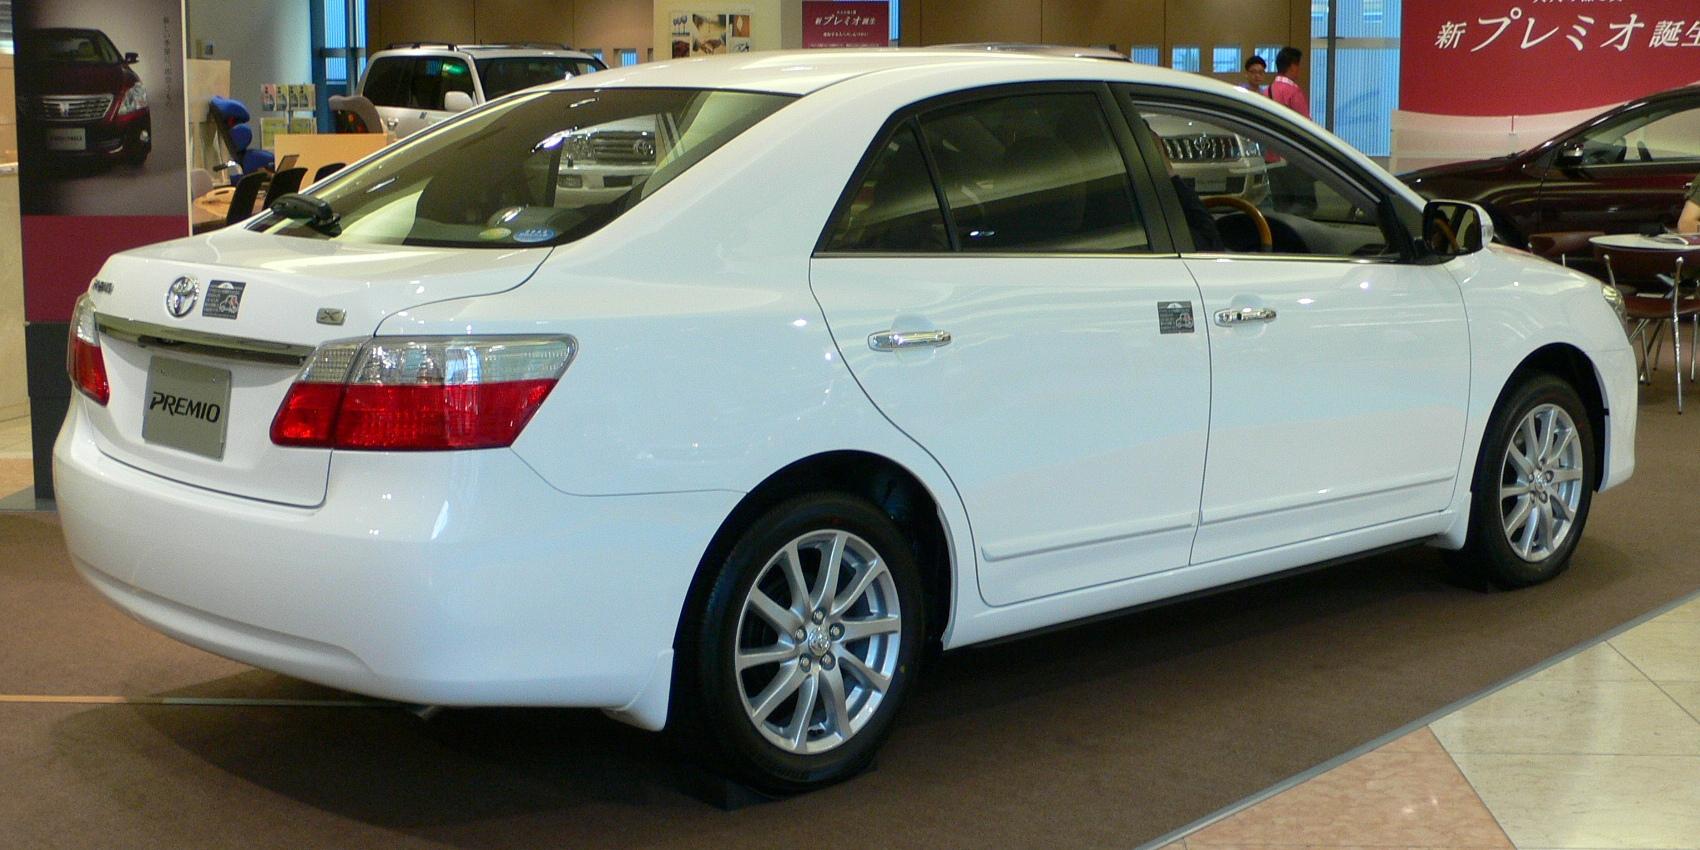 Toyota Premio I (T24) 2001 - 2007 Sedan #8